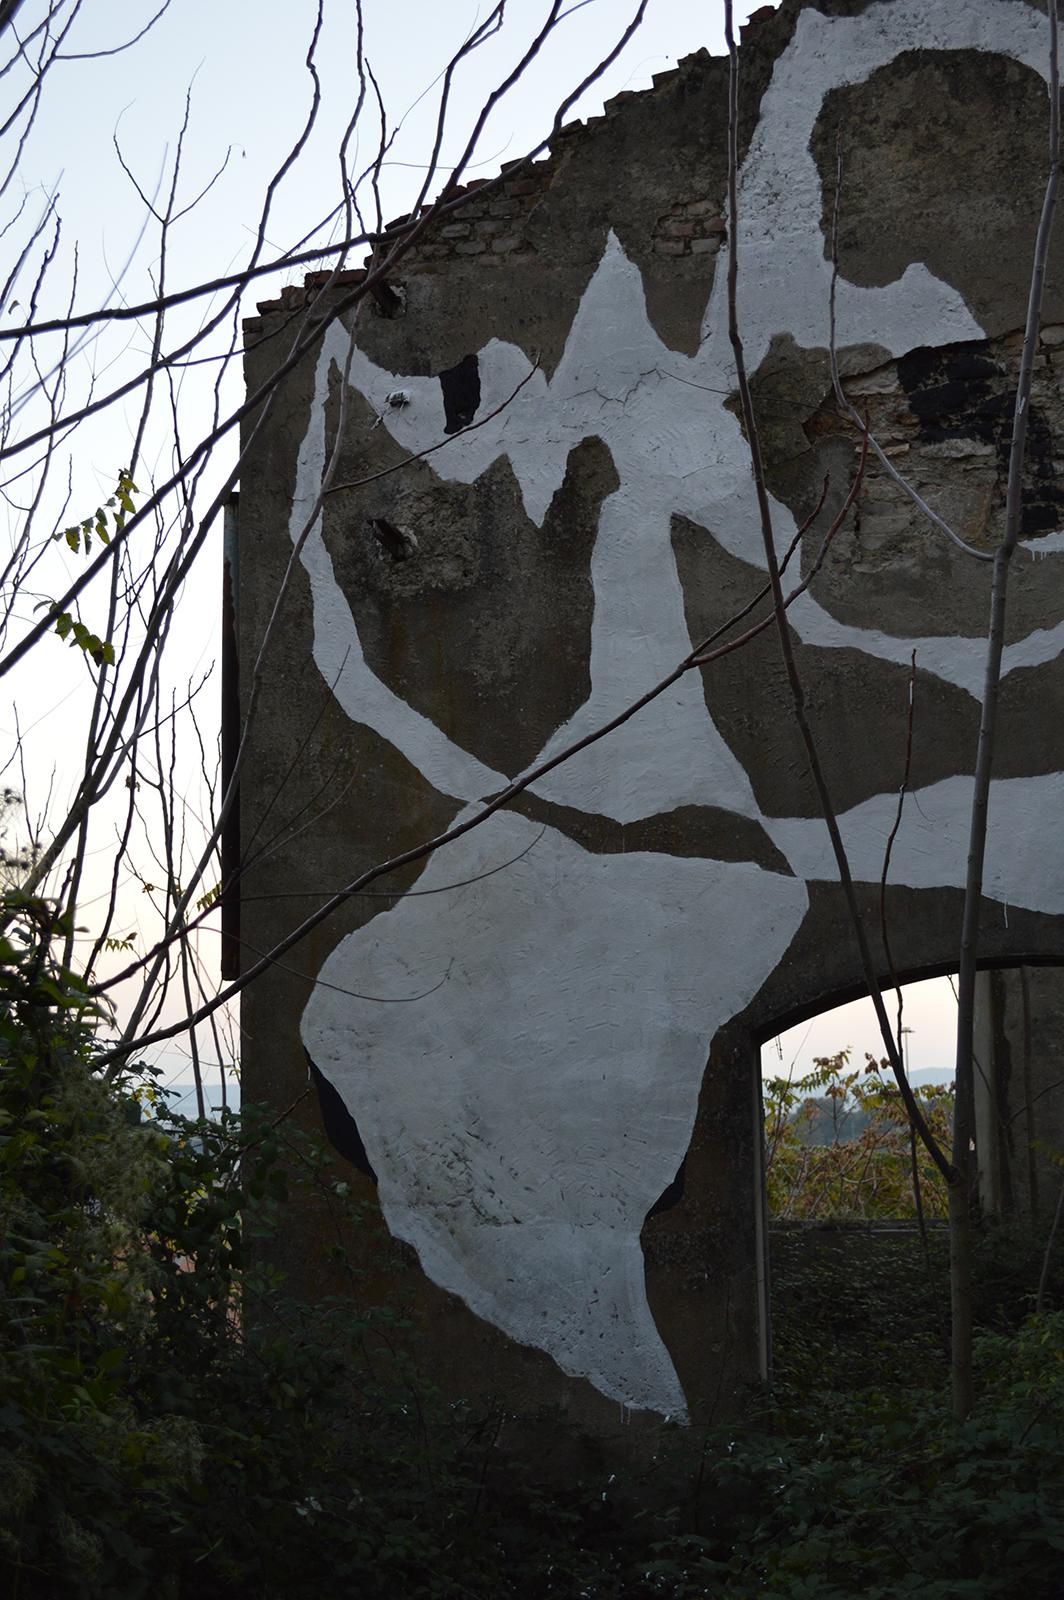 moallaseconda-new-mural-in-prato-07